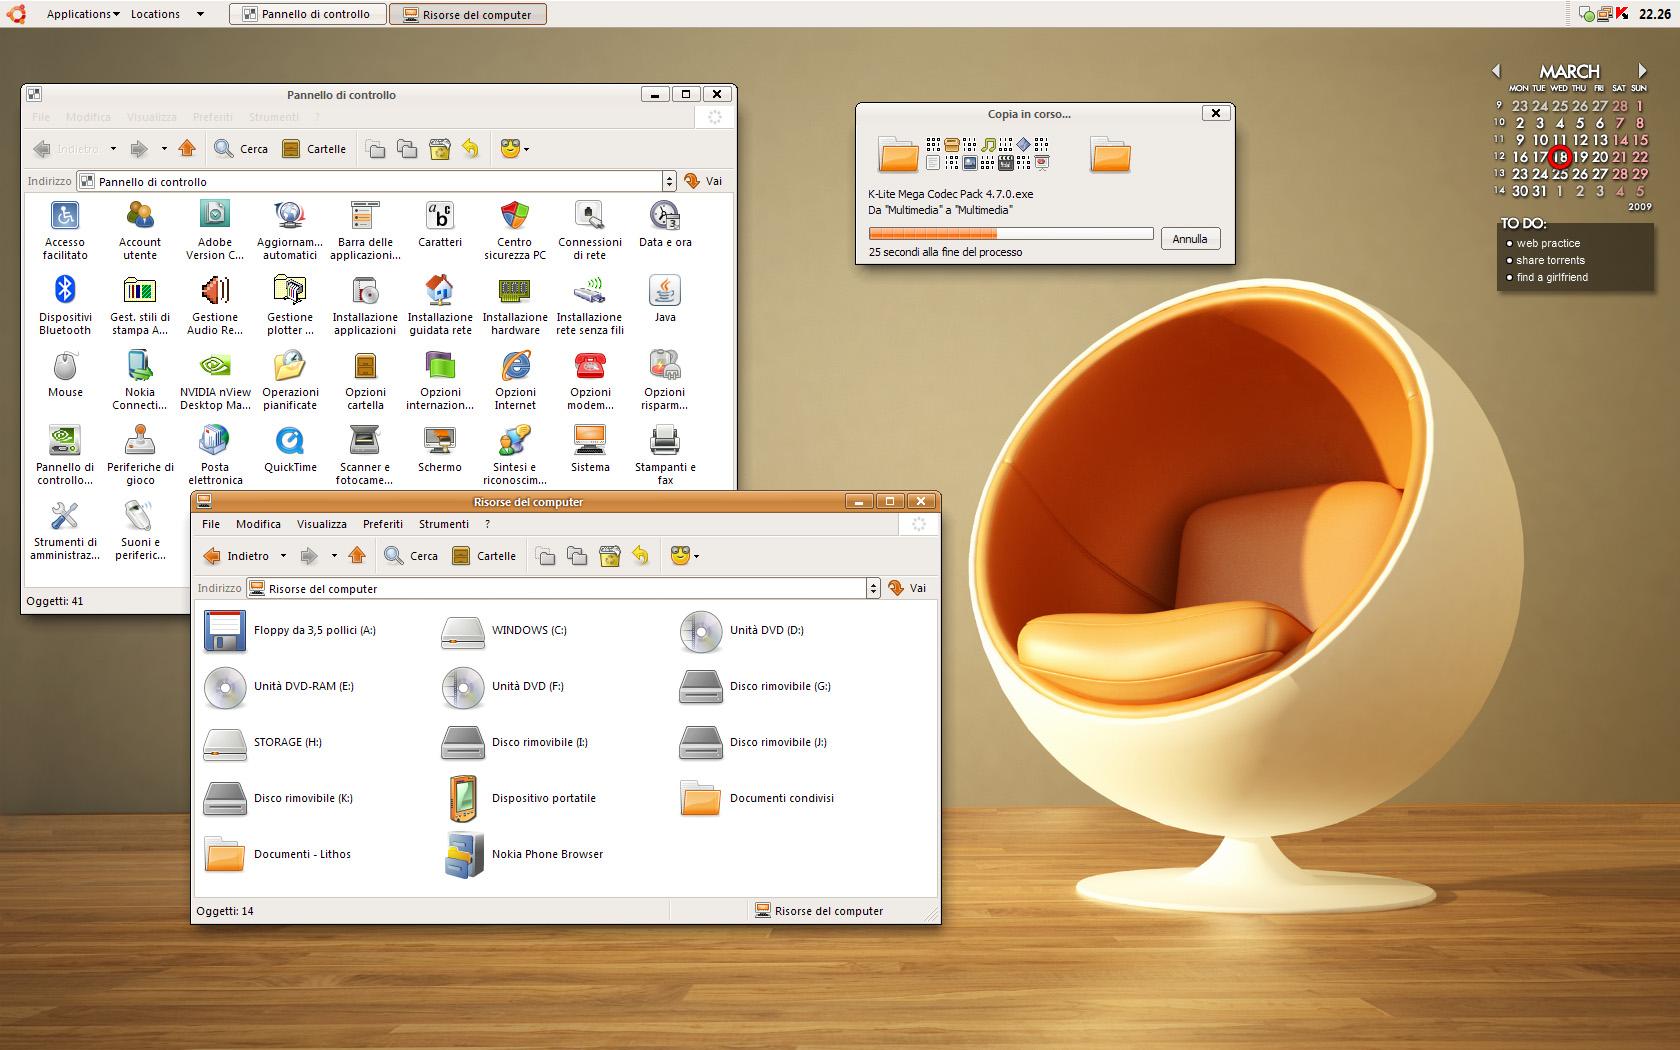 Human Desktop by MarcoFiorilli